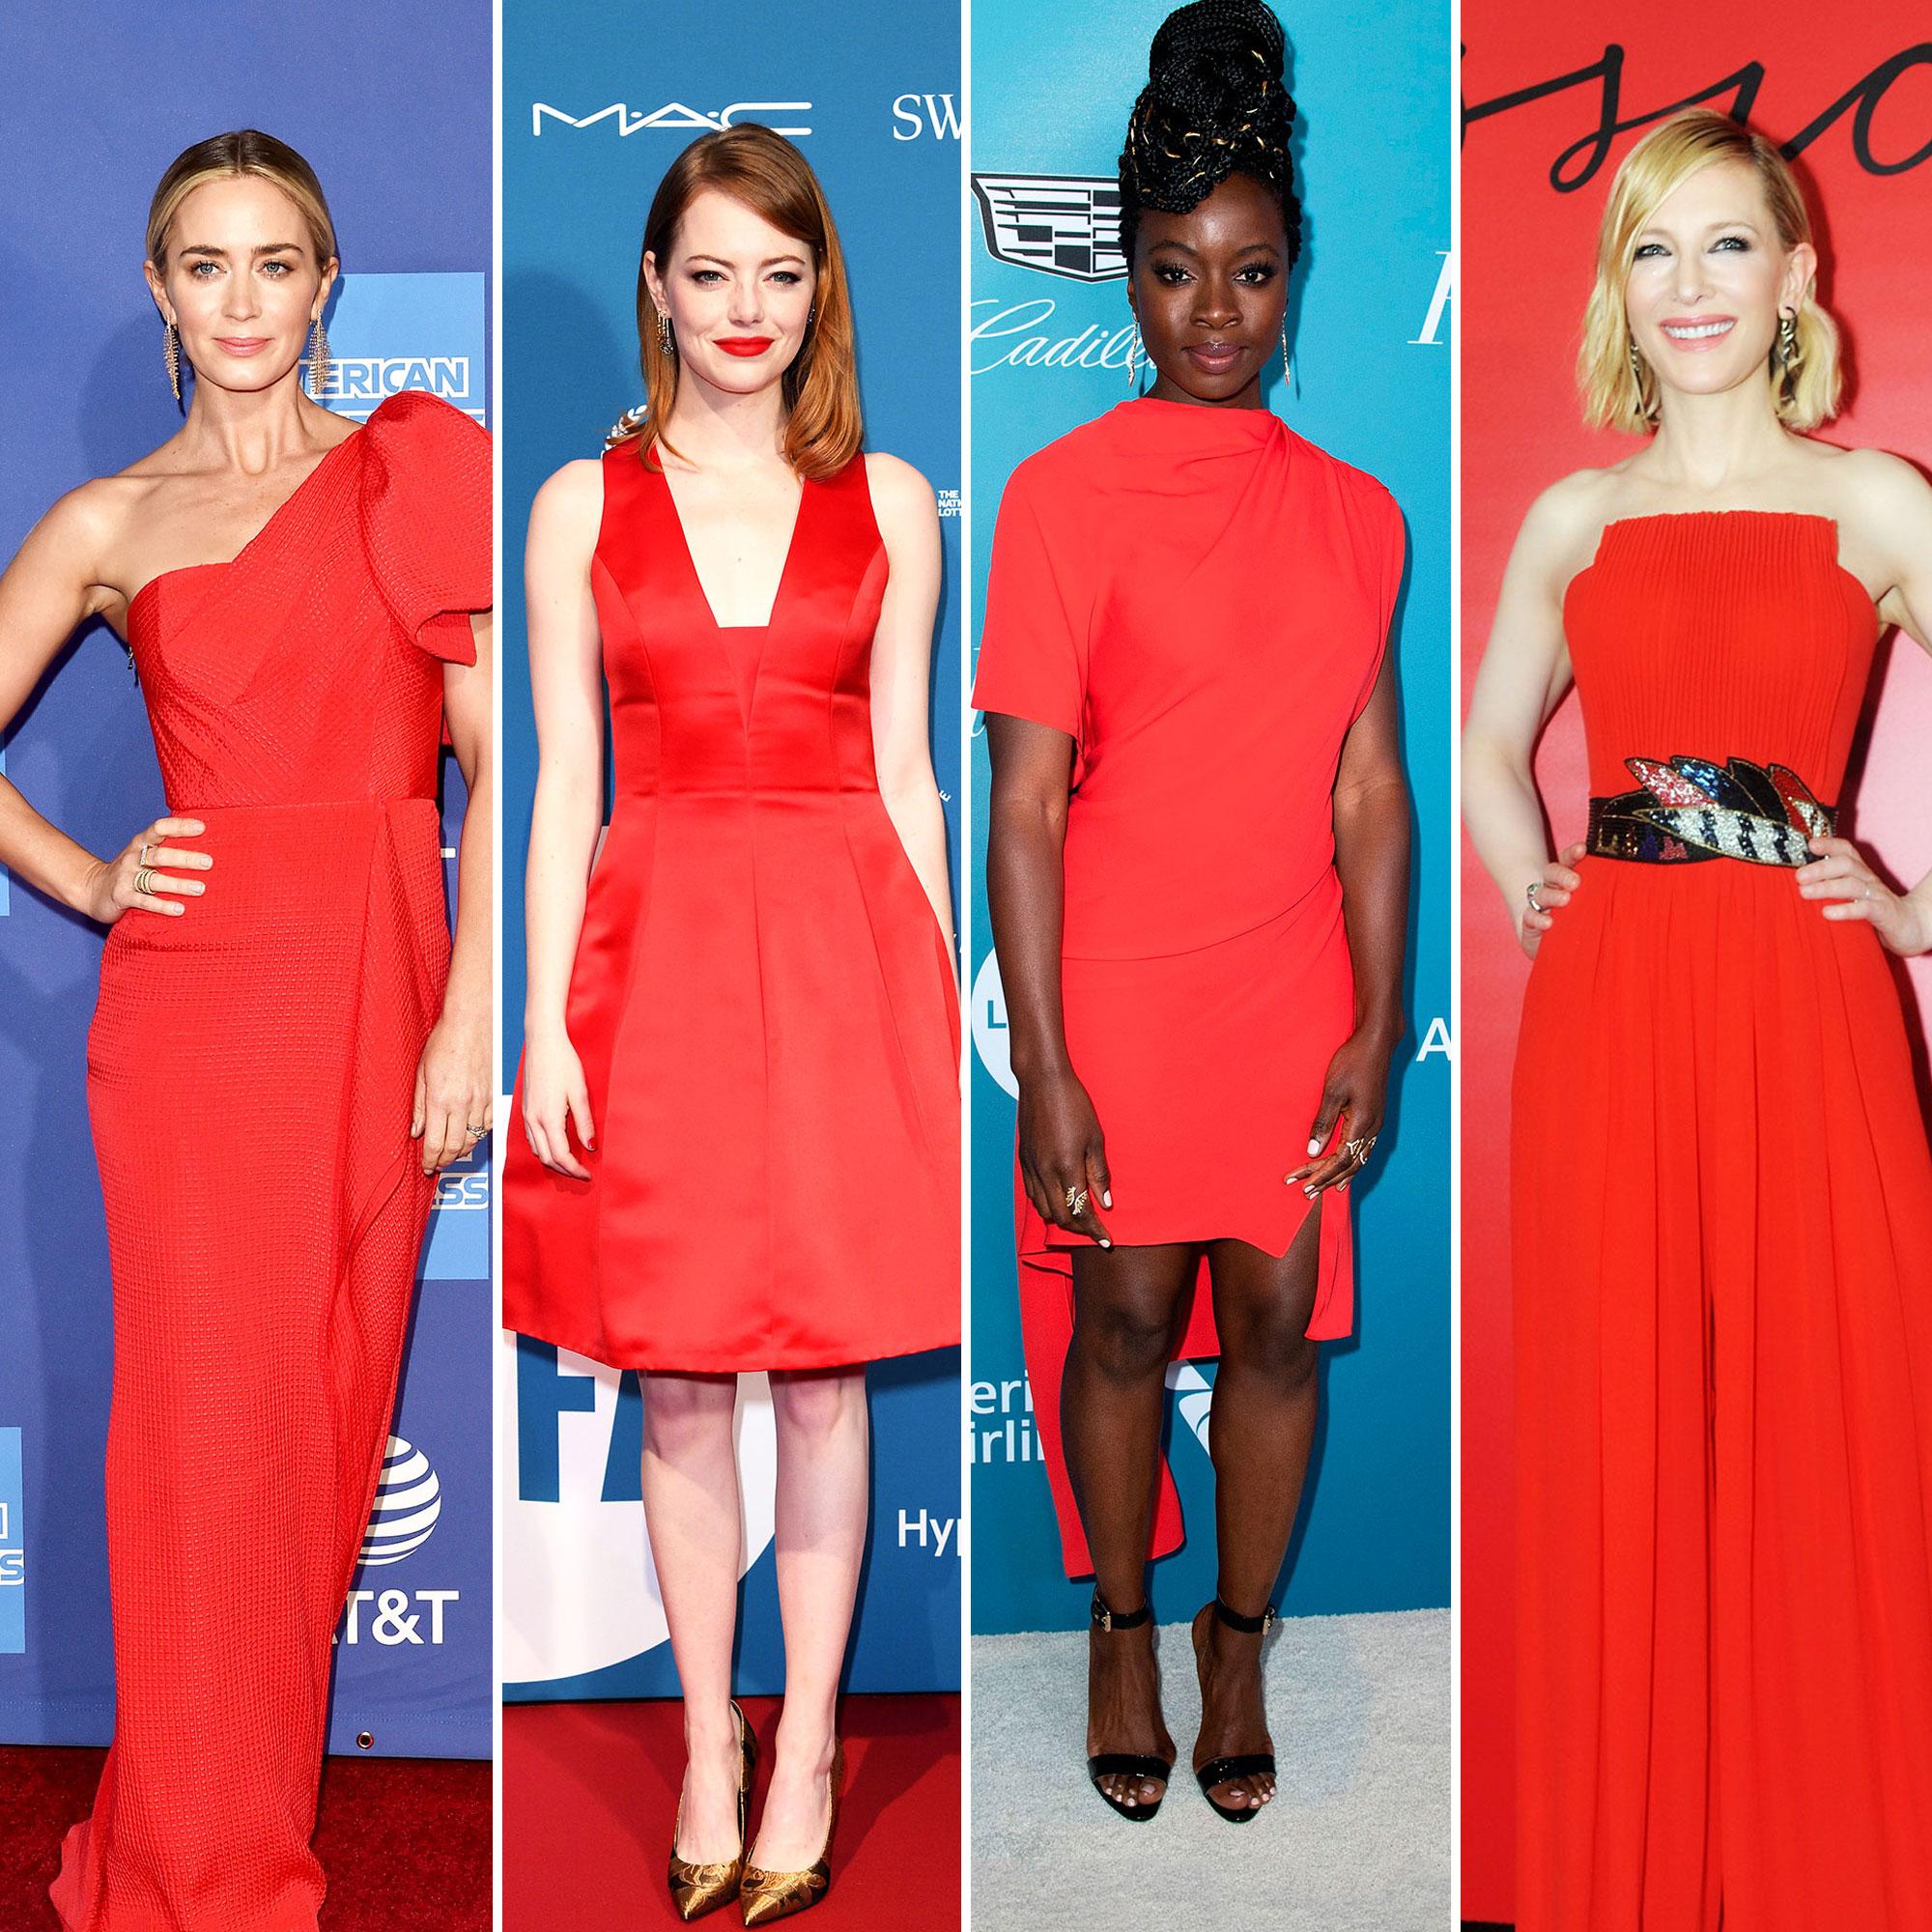 red carpet gallery for Stylish - Red - Emily blunt, Emma stone, Danai Gurira and Cate Blanchett